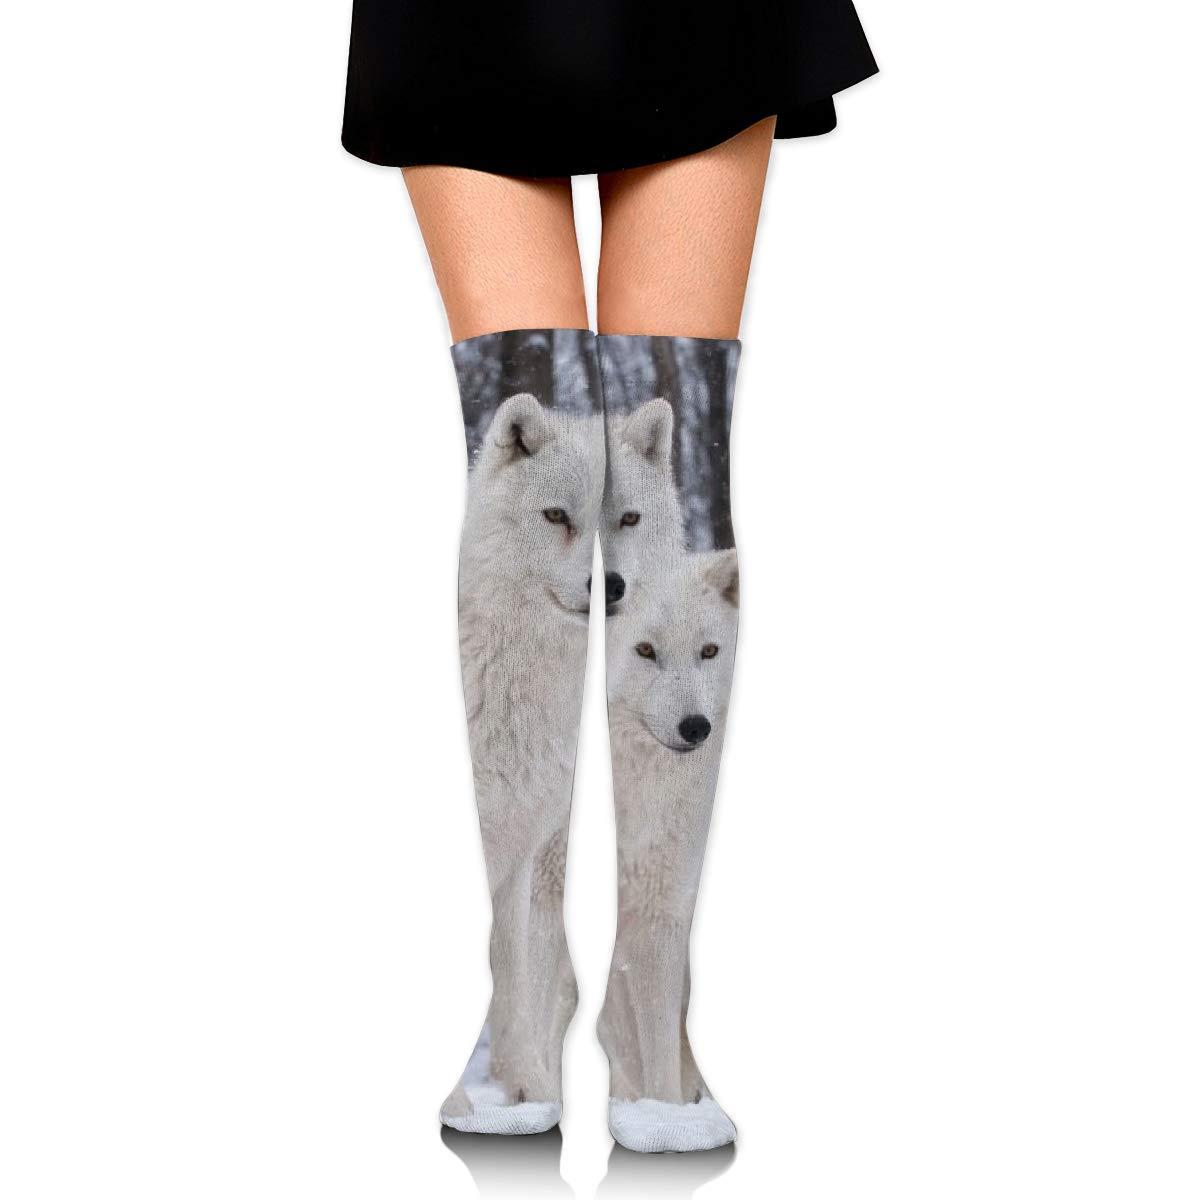 Women Crew Socks Thigh High Knee White Wolf Long Tube Dress Legging Soccer Compression Stocking